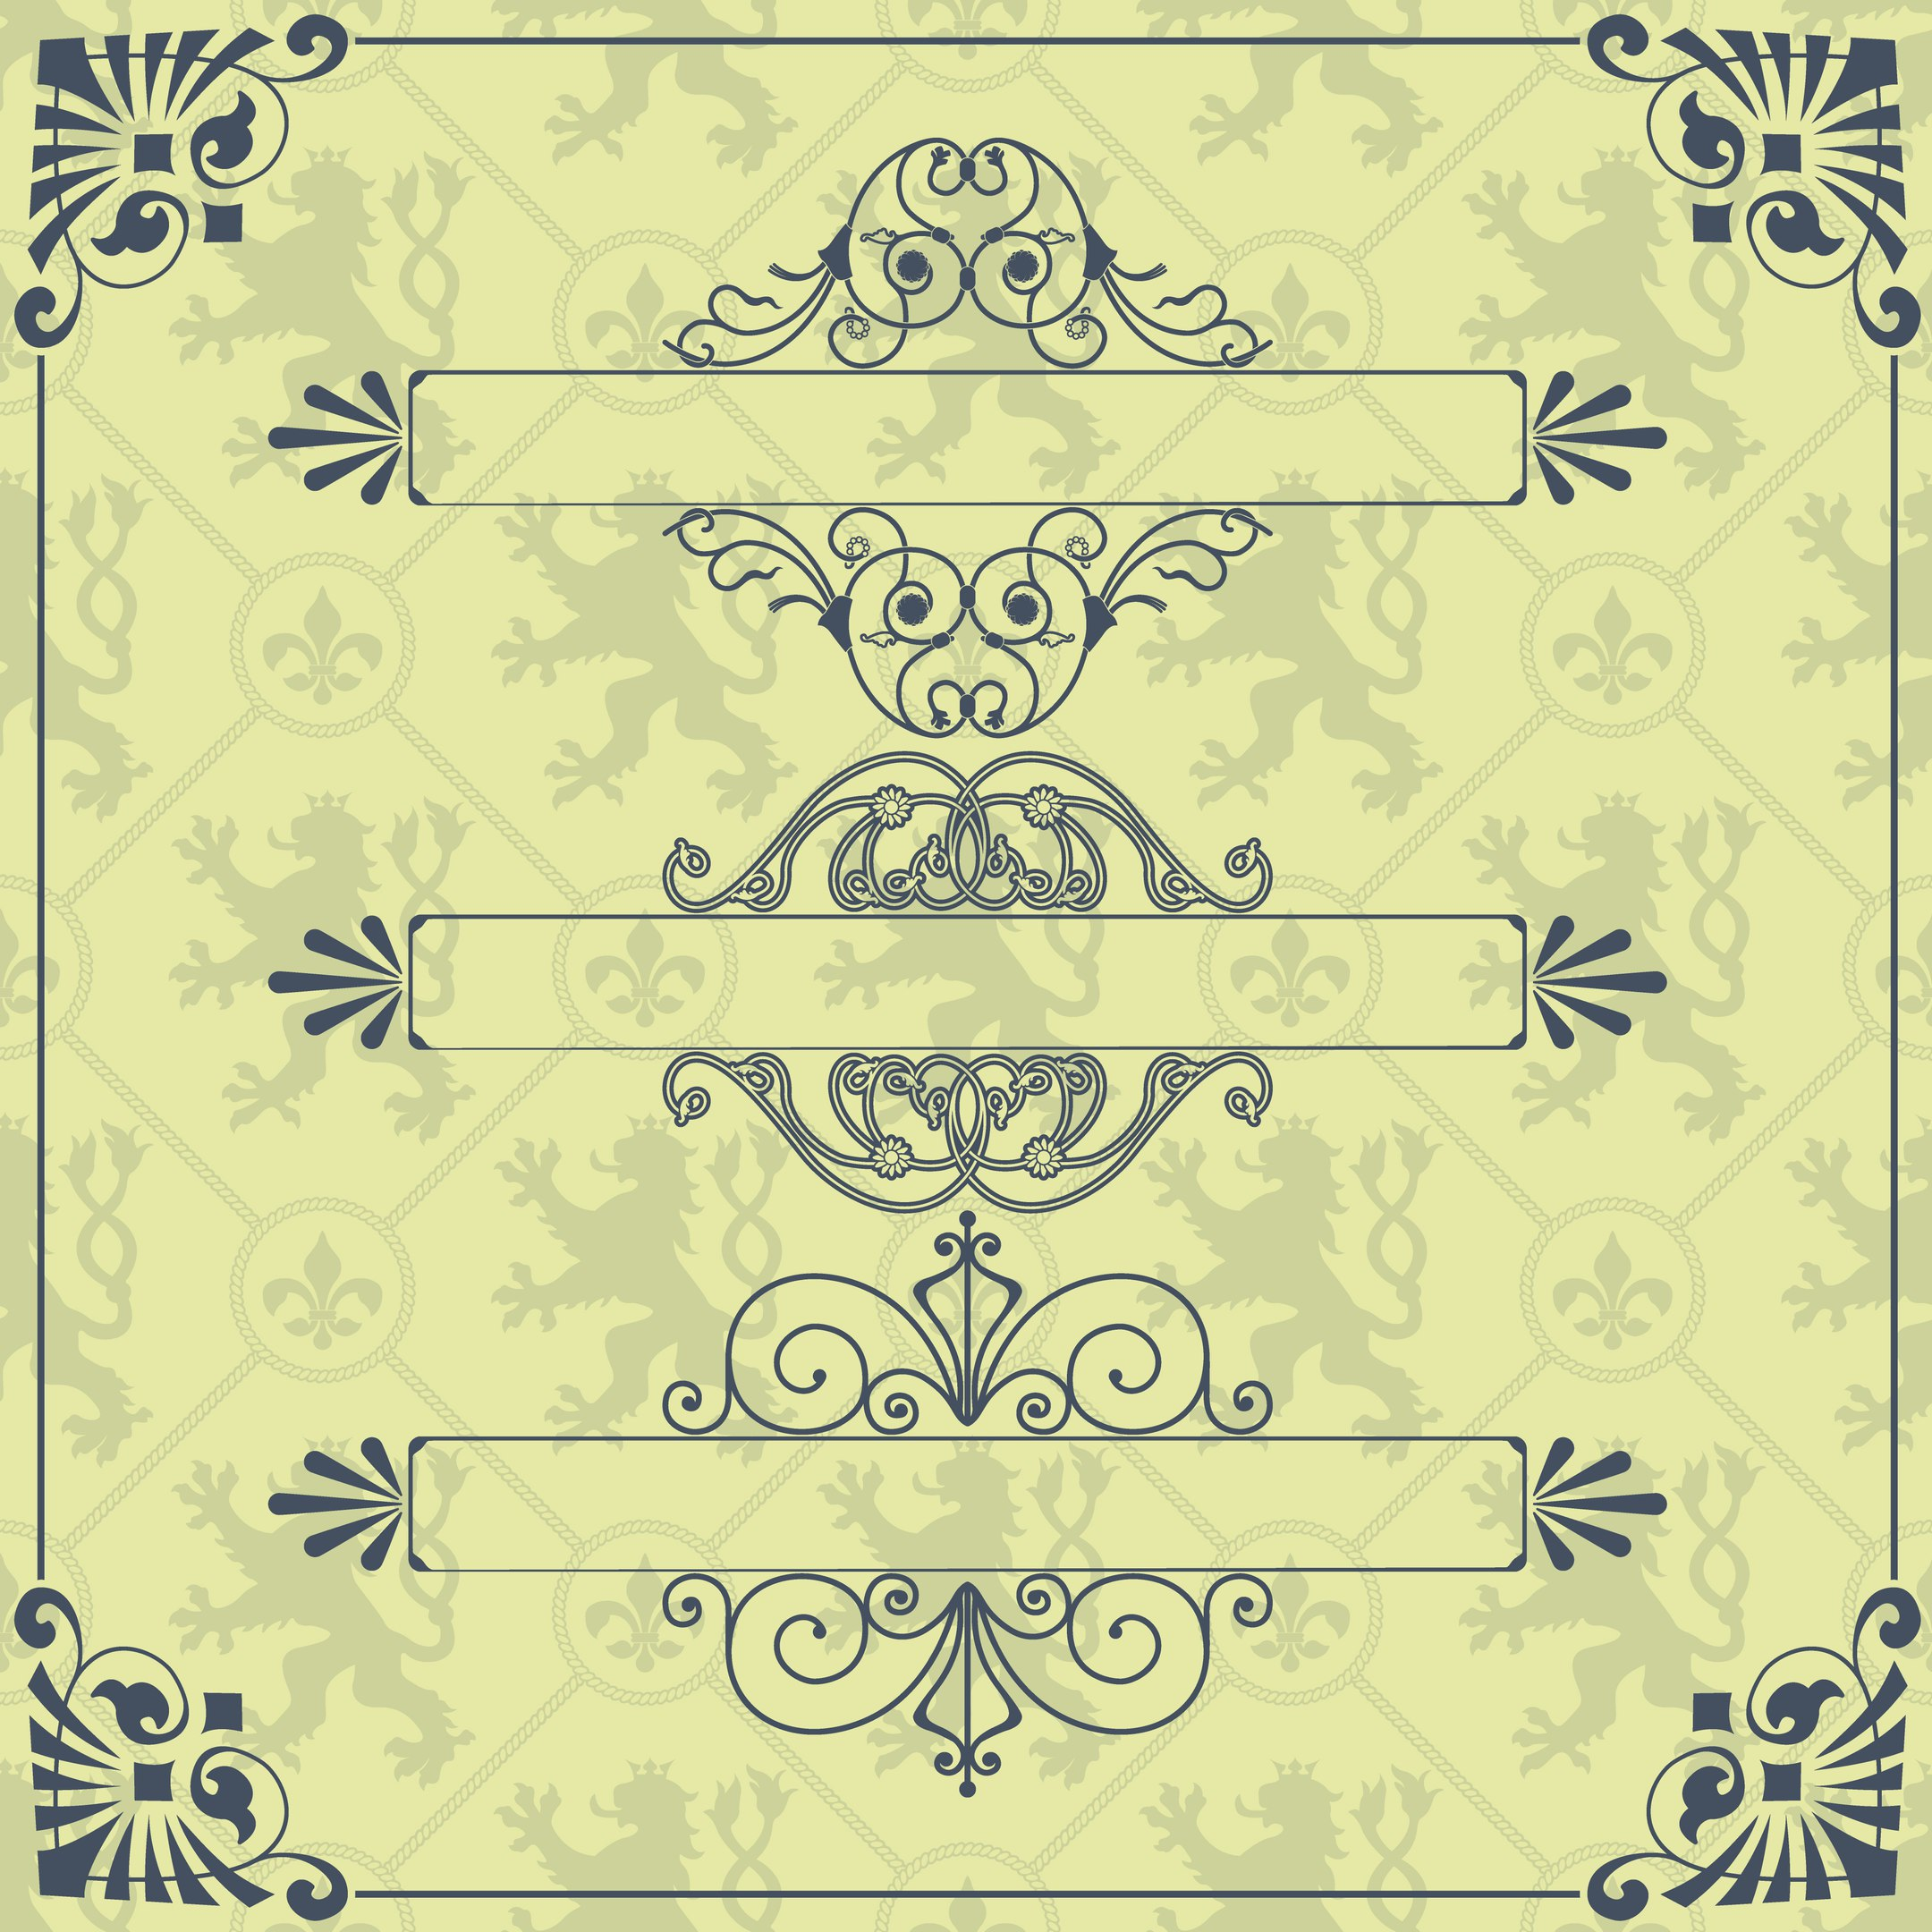 Decorative Calligraphic Frame Set Free Vector